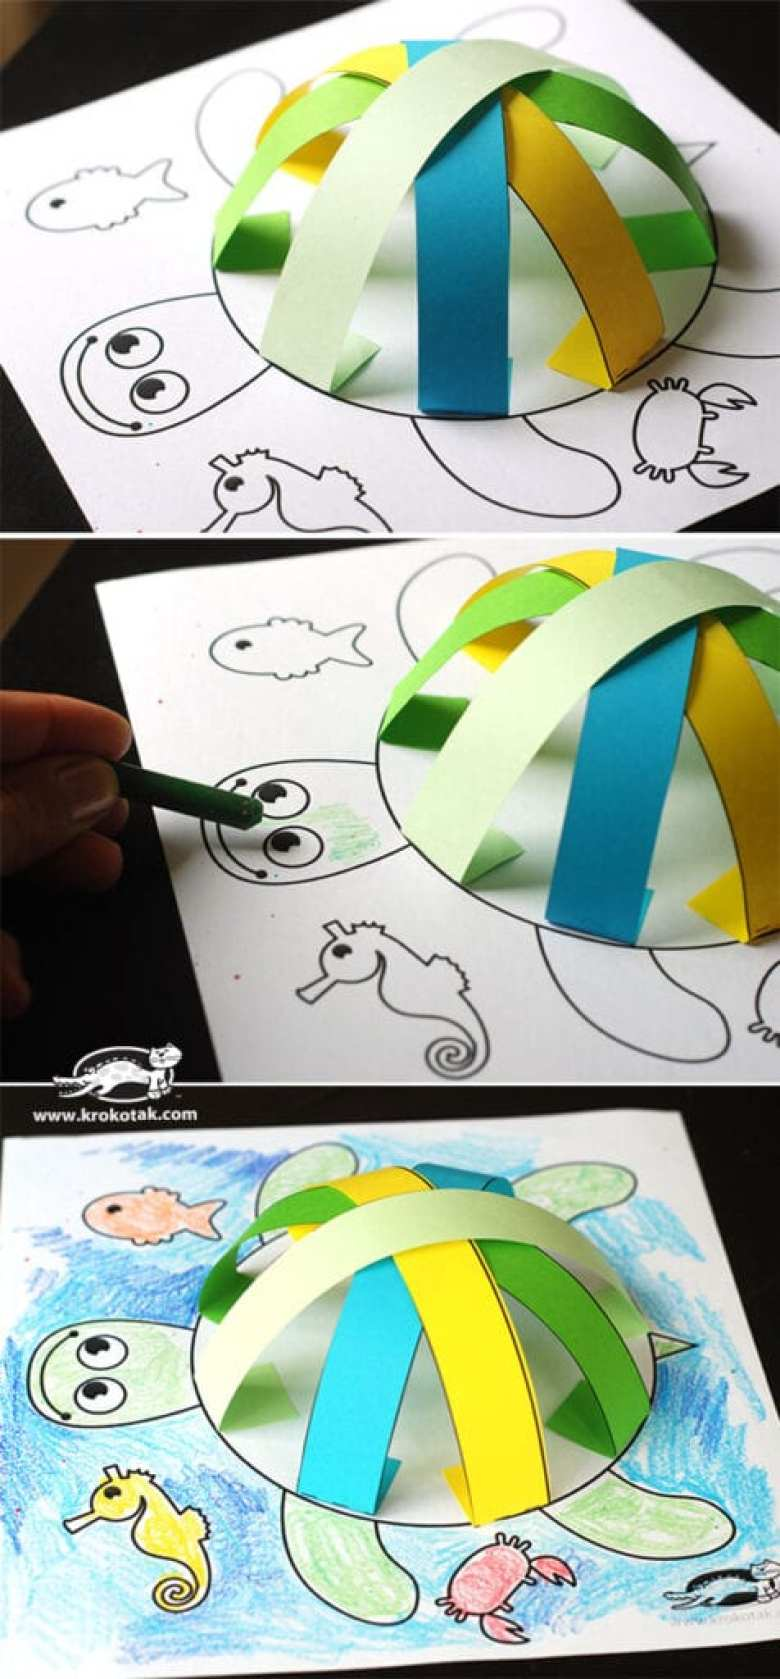 pyssel, pysseltips, pyssla, papper, papperspyssel, pyssla med papper, målarbild, målarbild för barn, sköldpadda